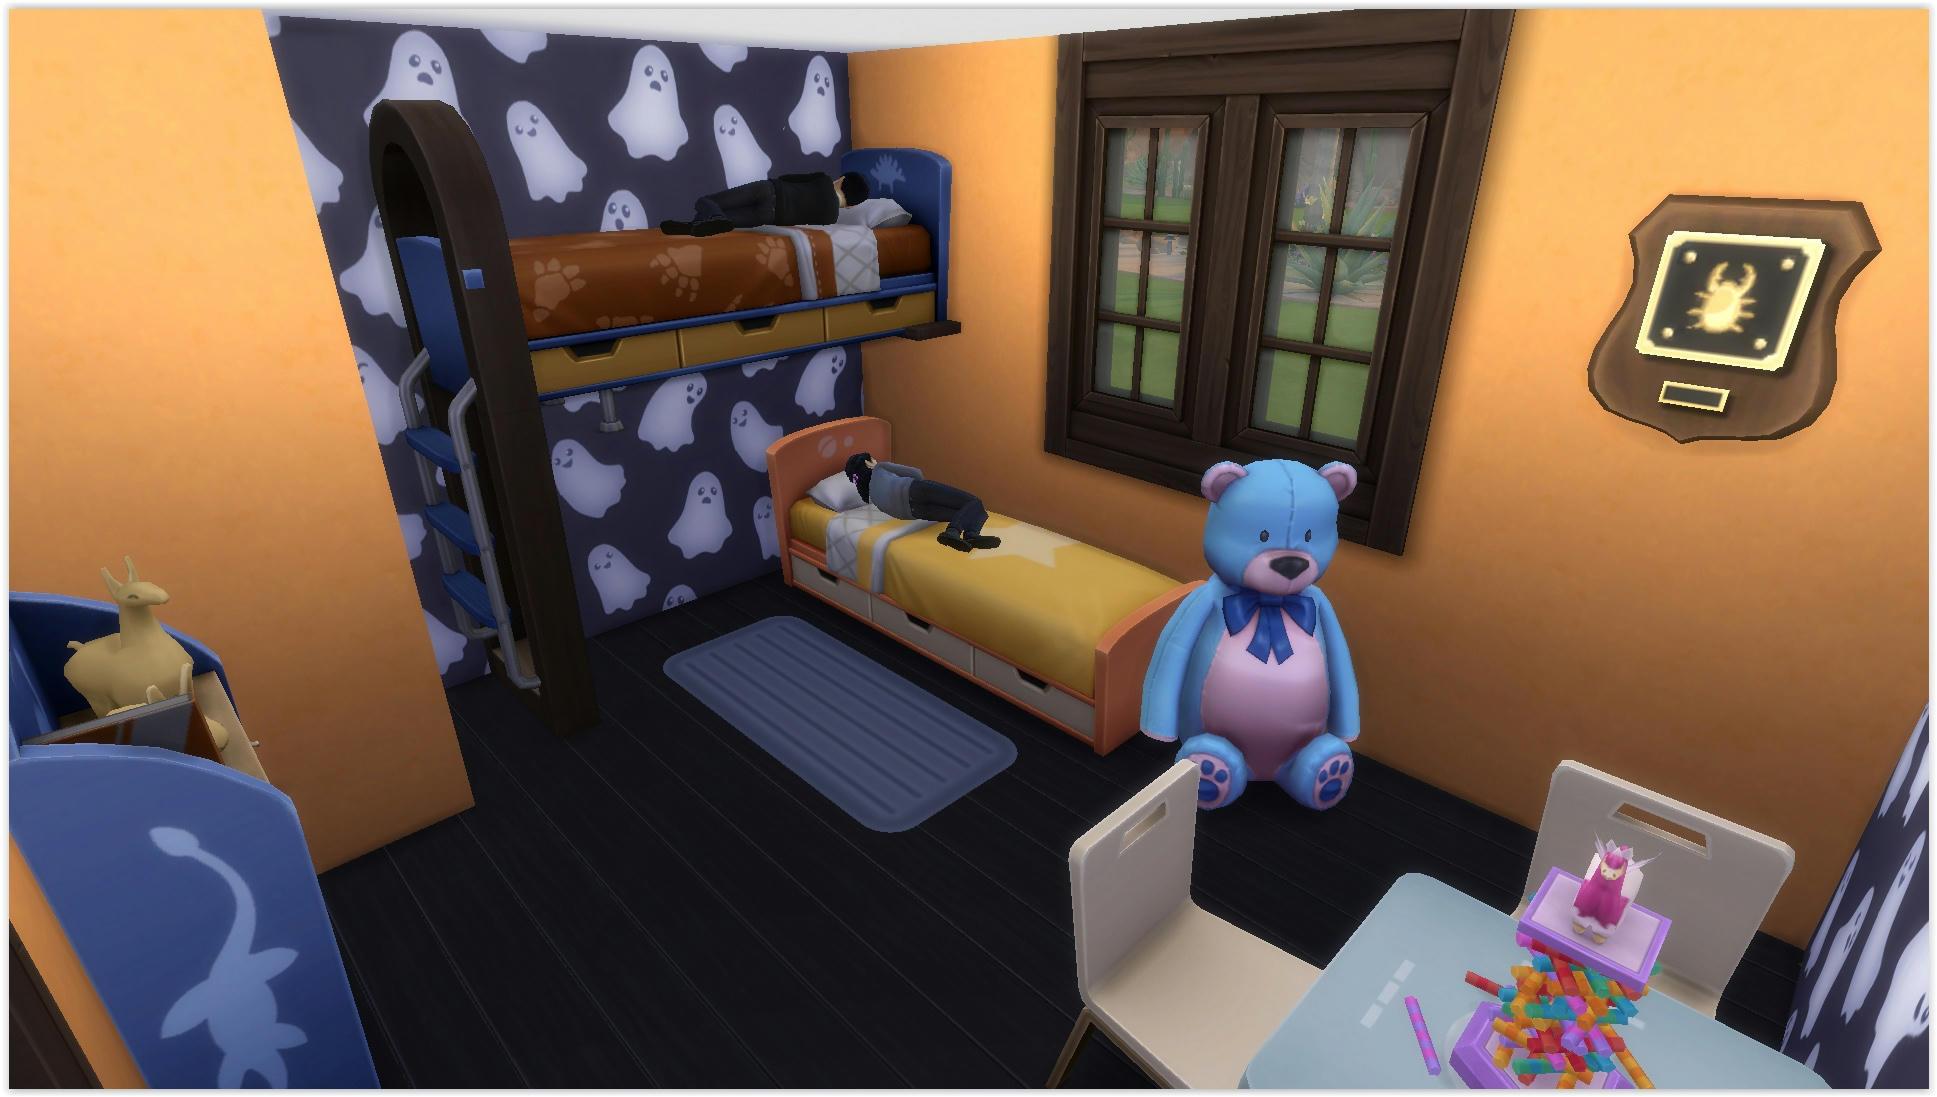 [Débutant] Construire des lits superposés utilisables 543cfxbxlj1qca3zg